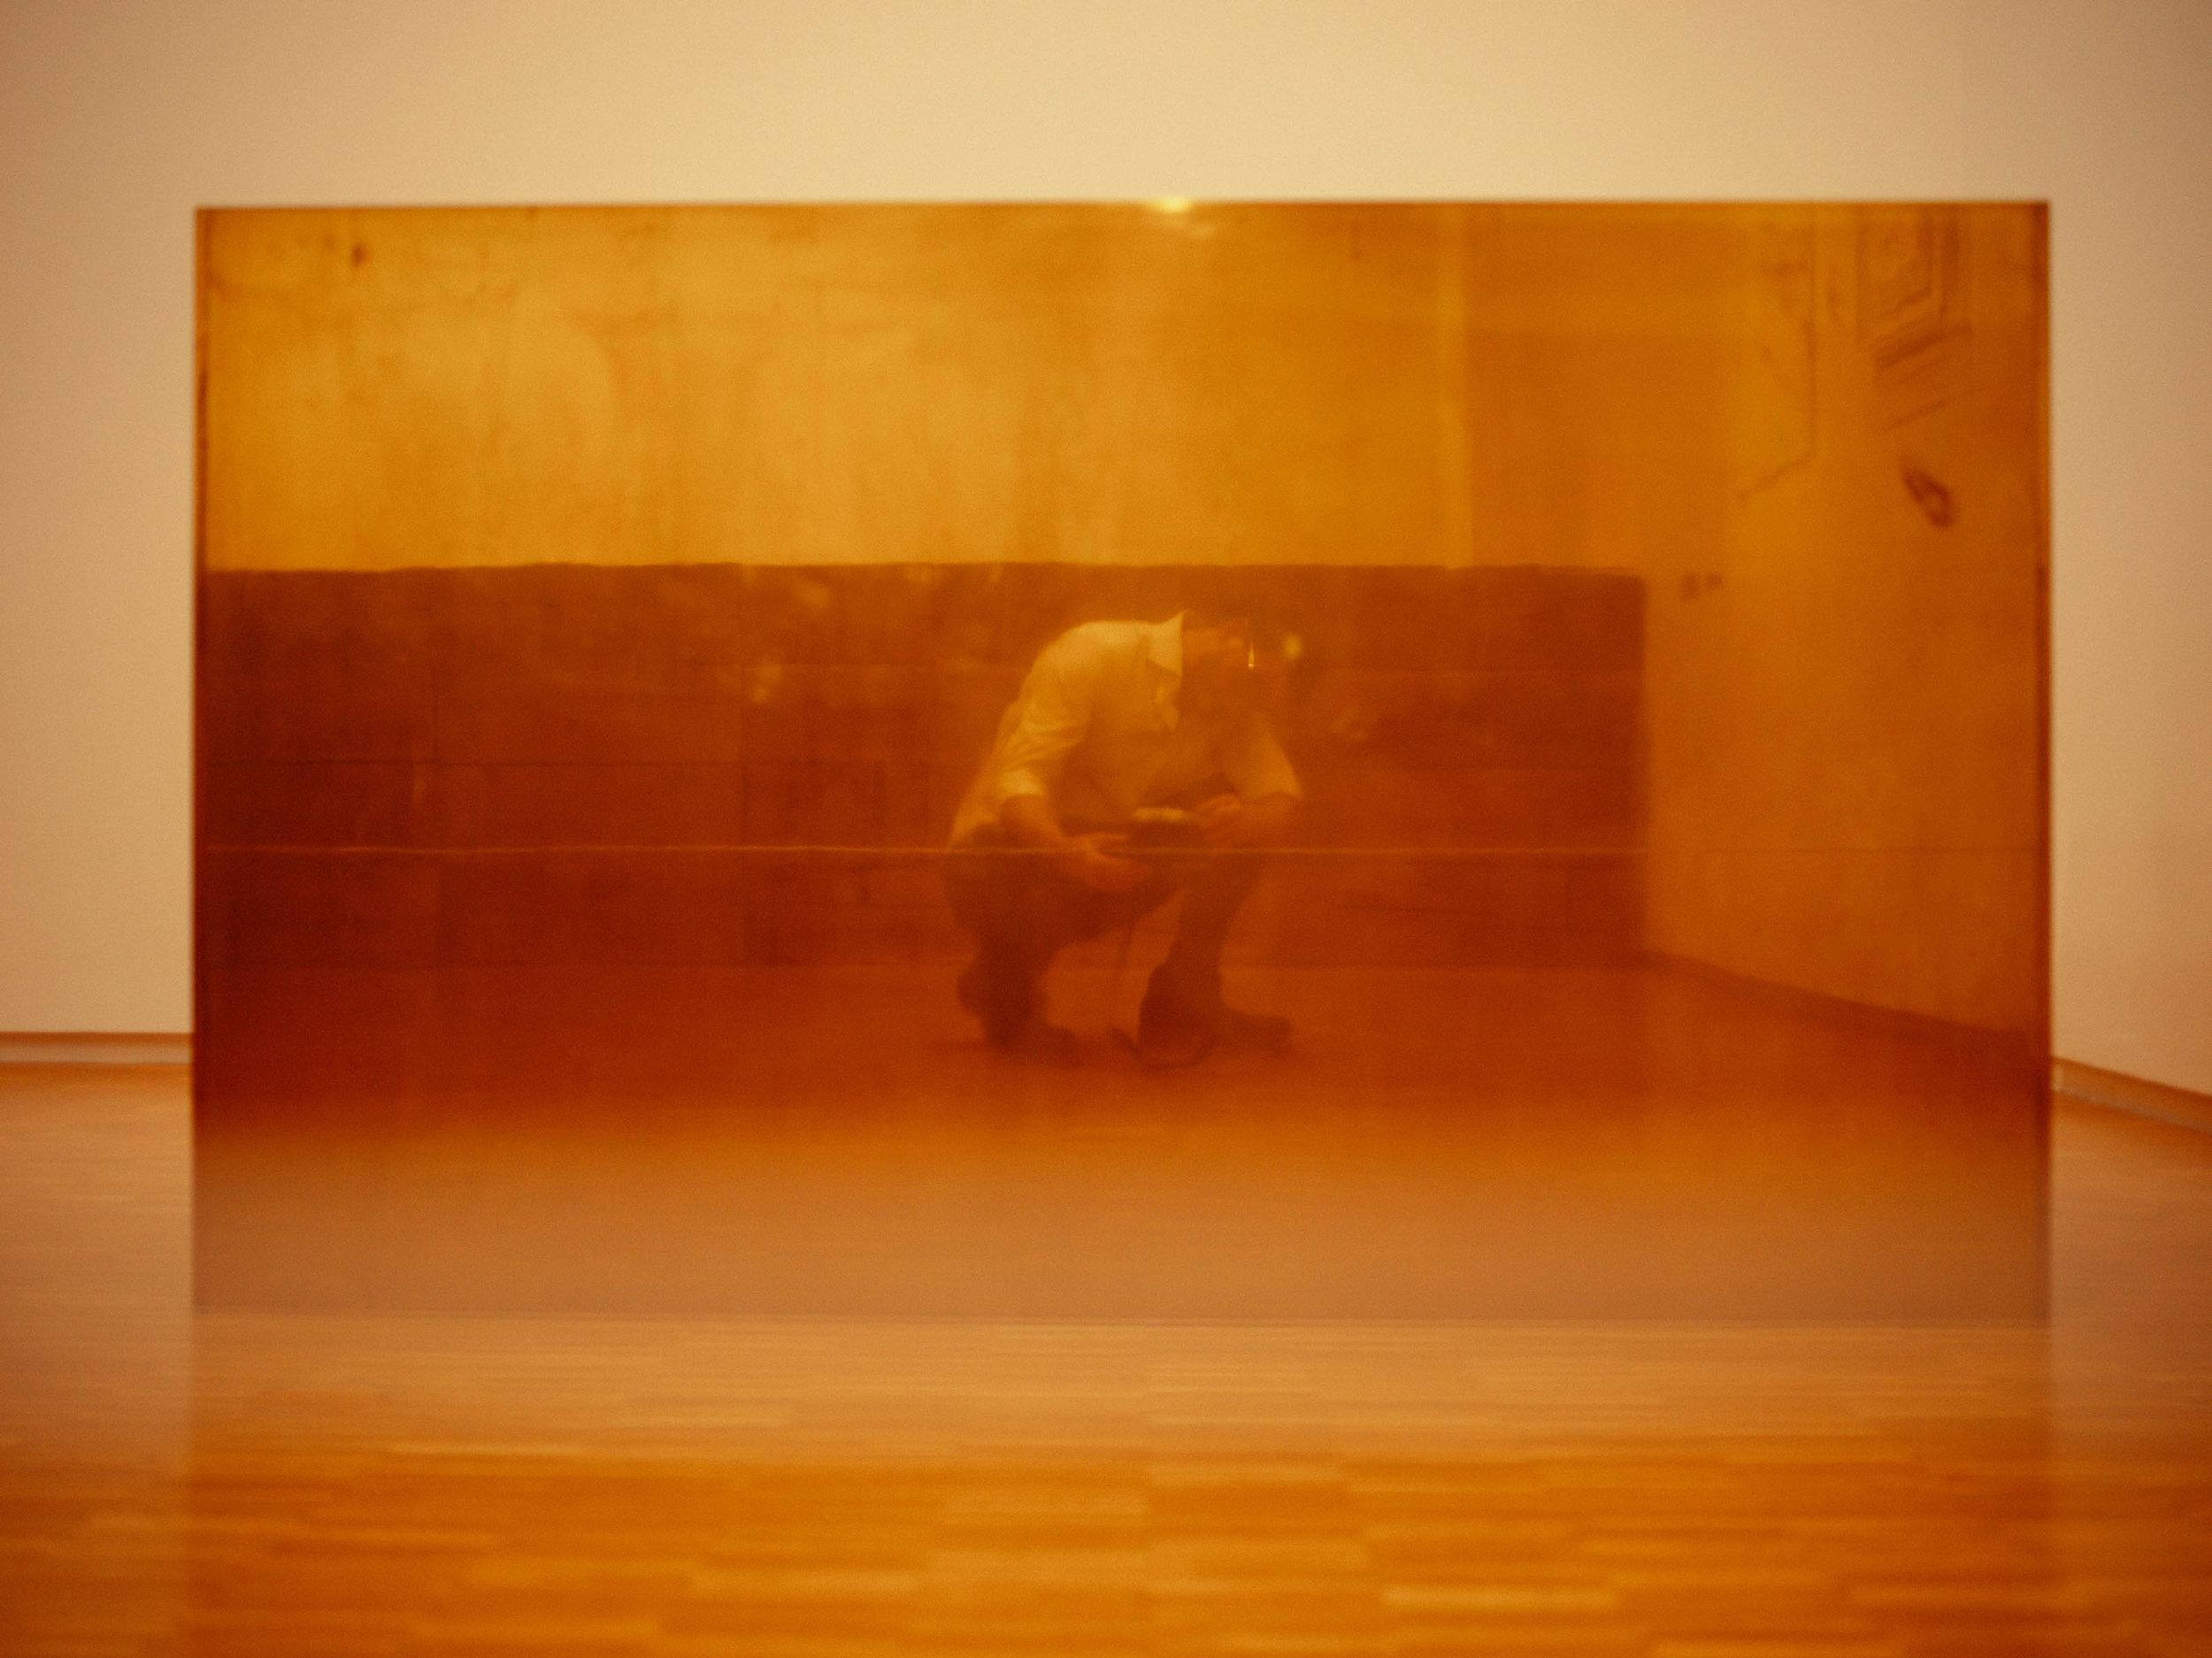 Otro de mis yo. Donald Judd, Centro Pompidou, Paris 2019.